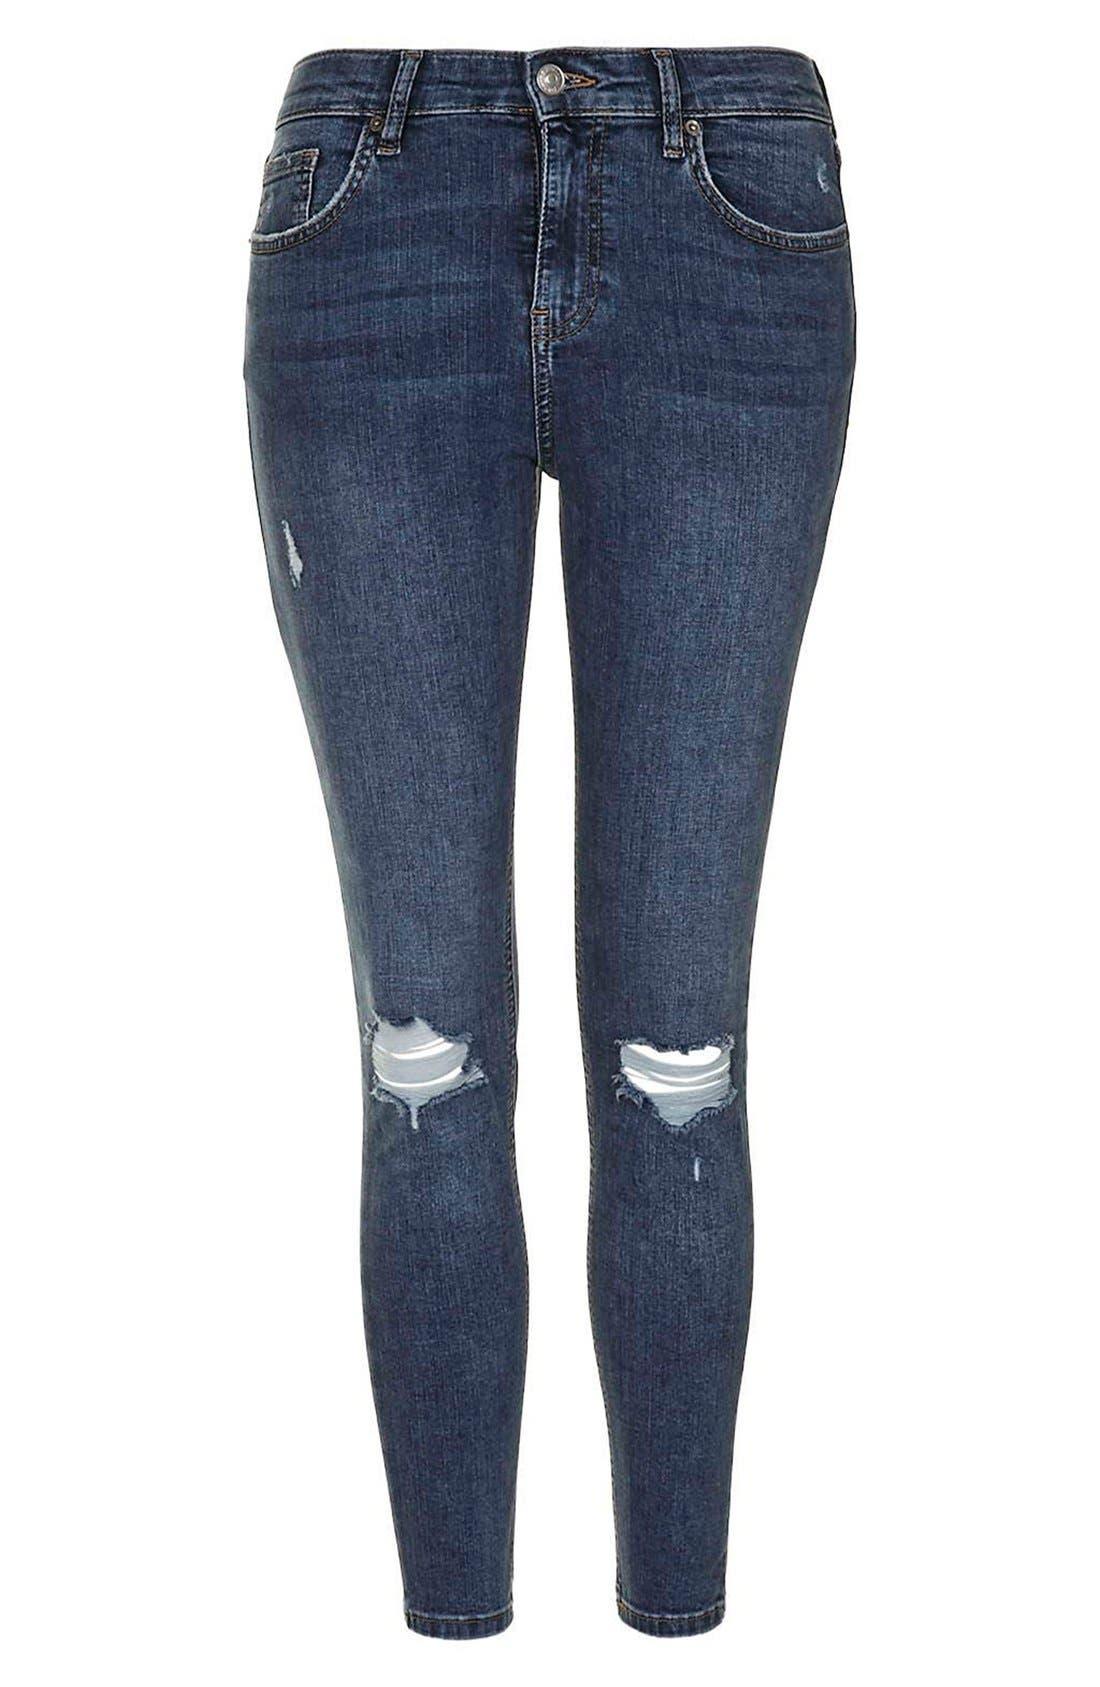 Moto 'Jamie' Ripped Skinny Ankle Jeans,                             Alternate thumbnail 4, color,                             Mid Denim